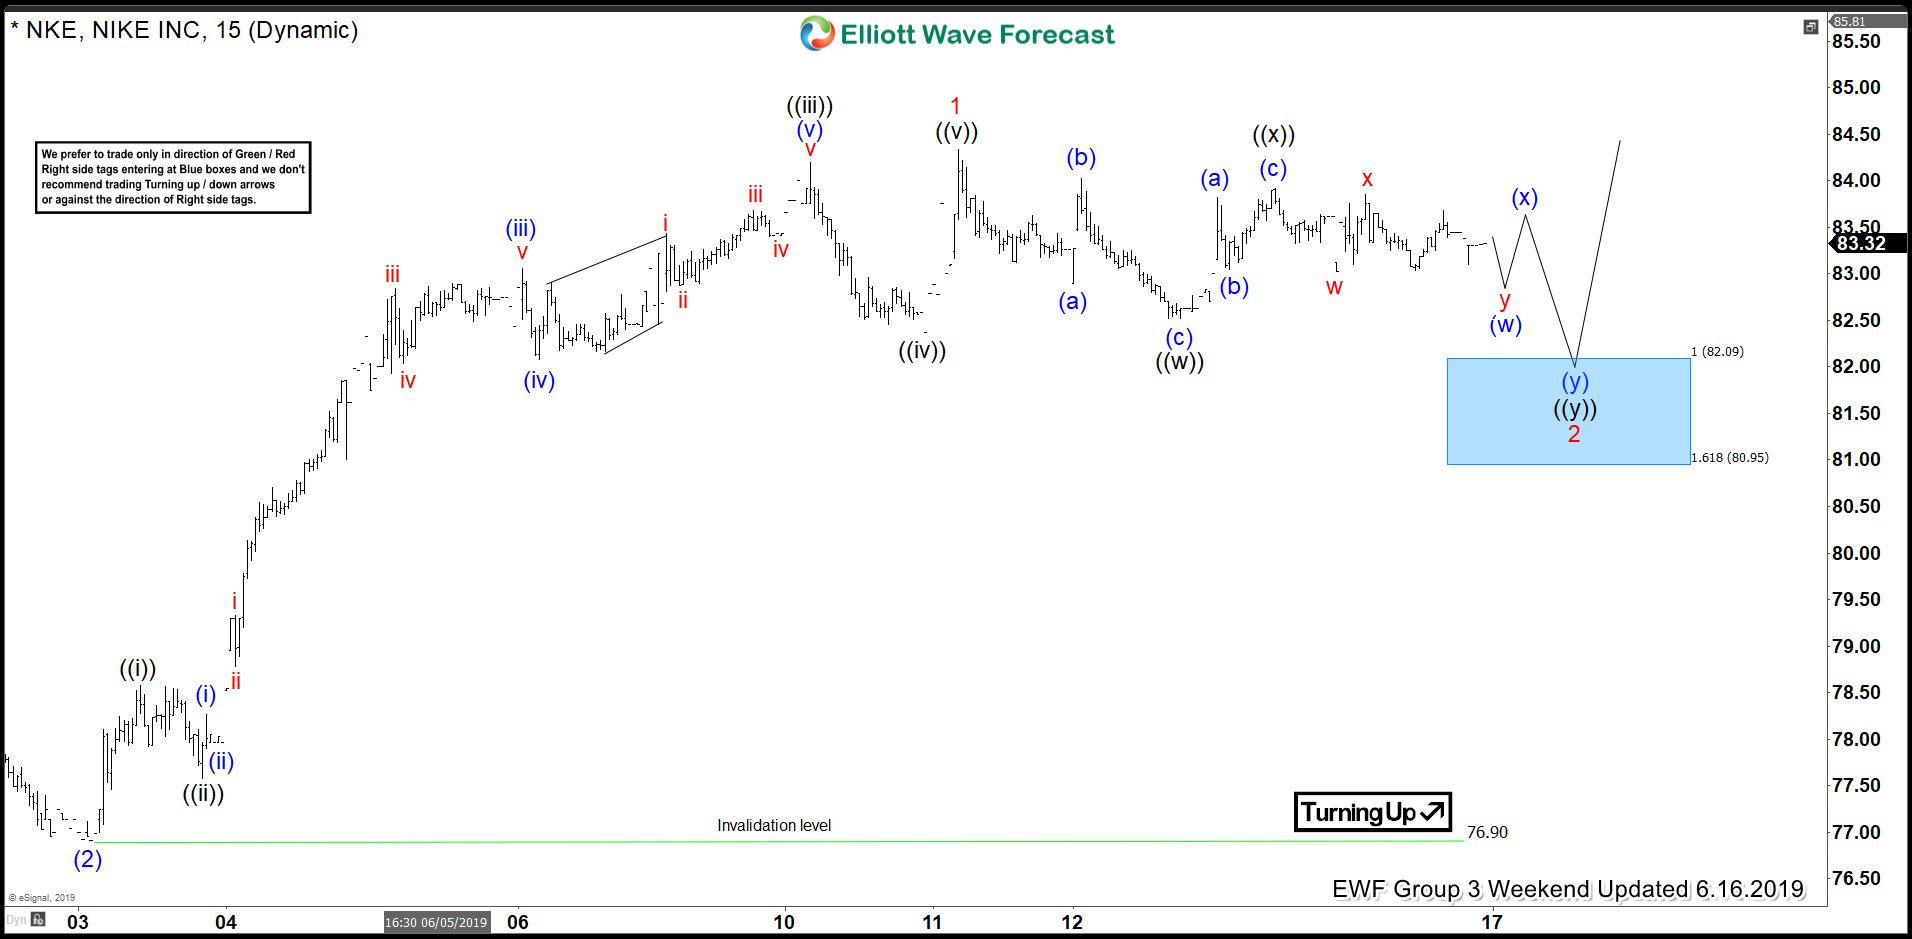 Nike Forecasting The Elliott Wave Path